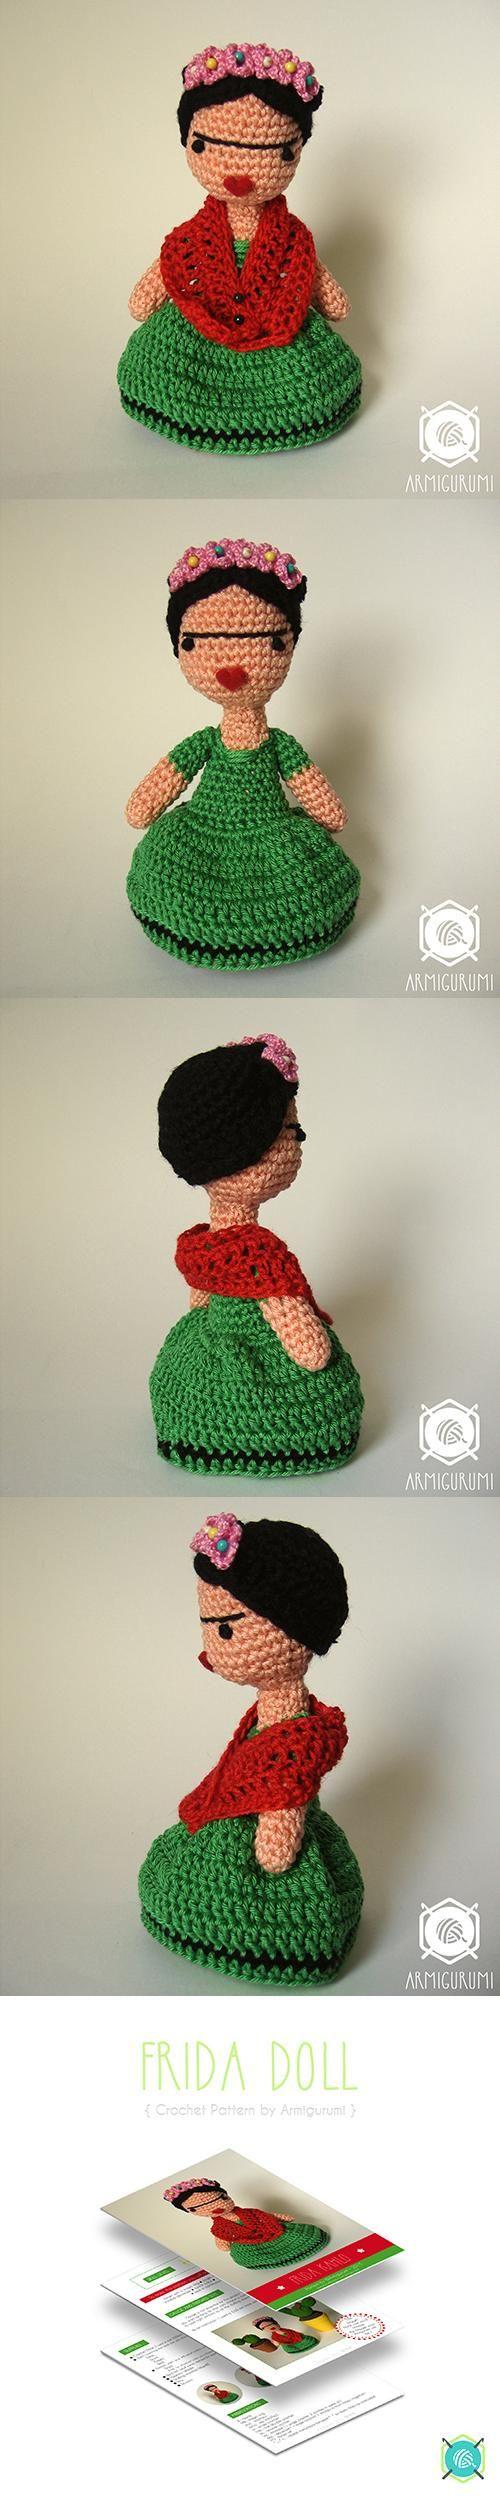 Frida Doll Amigurumi Pattern This is so cute! I love it!